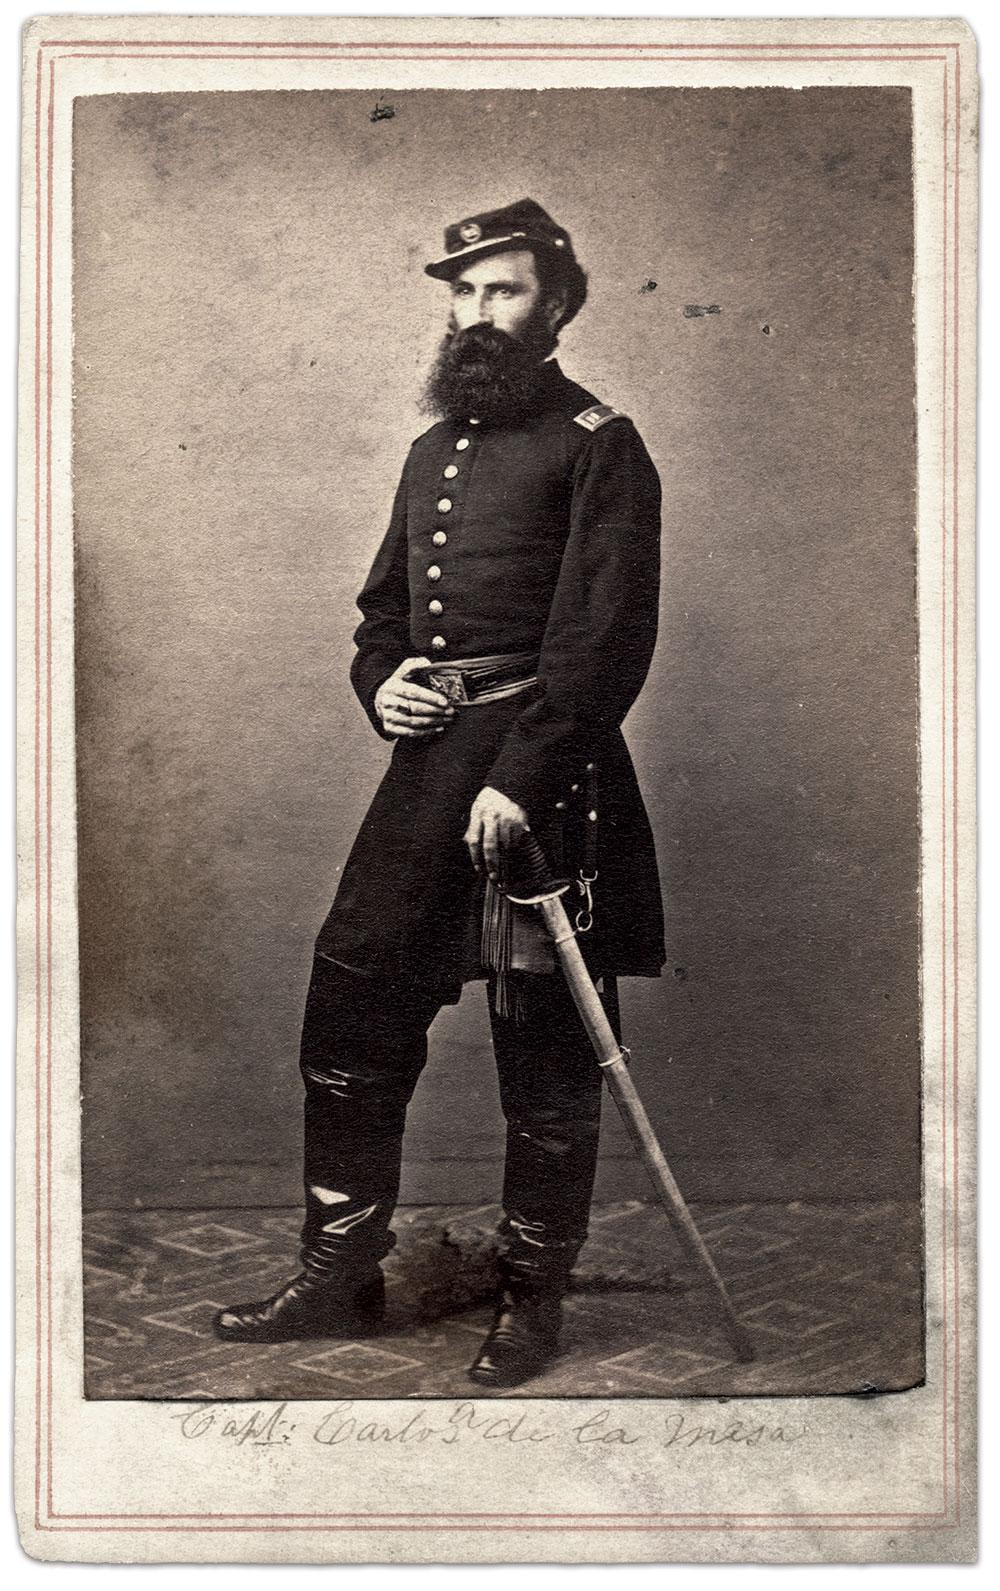 Carlos Alvarez de la Mesa, pictured as a captain in the 39th New York Infantry. Carte de visite by Joshua Appleby Williams of Lovell General Hospital, U.S.A., Portsmouth Grove, R.I. Ronald S. Coddington Collection.